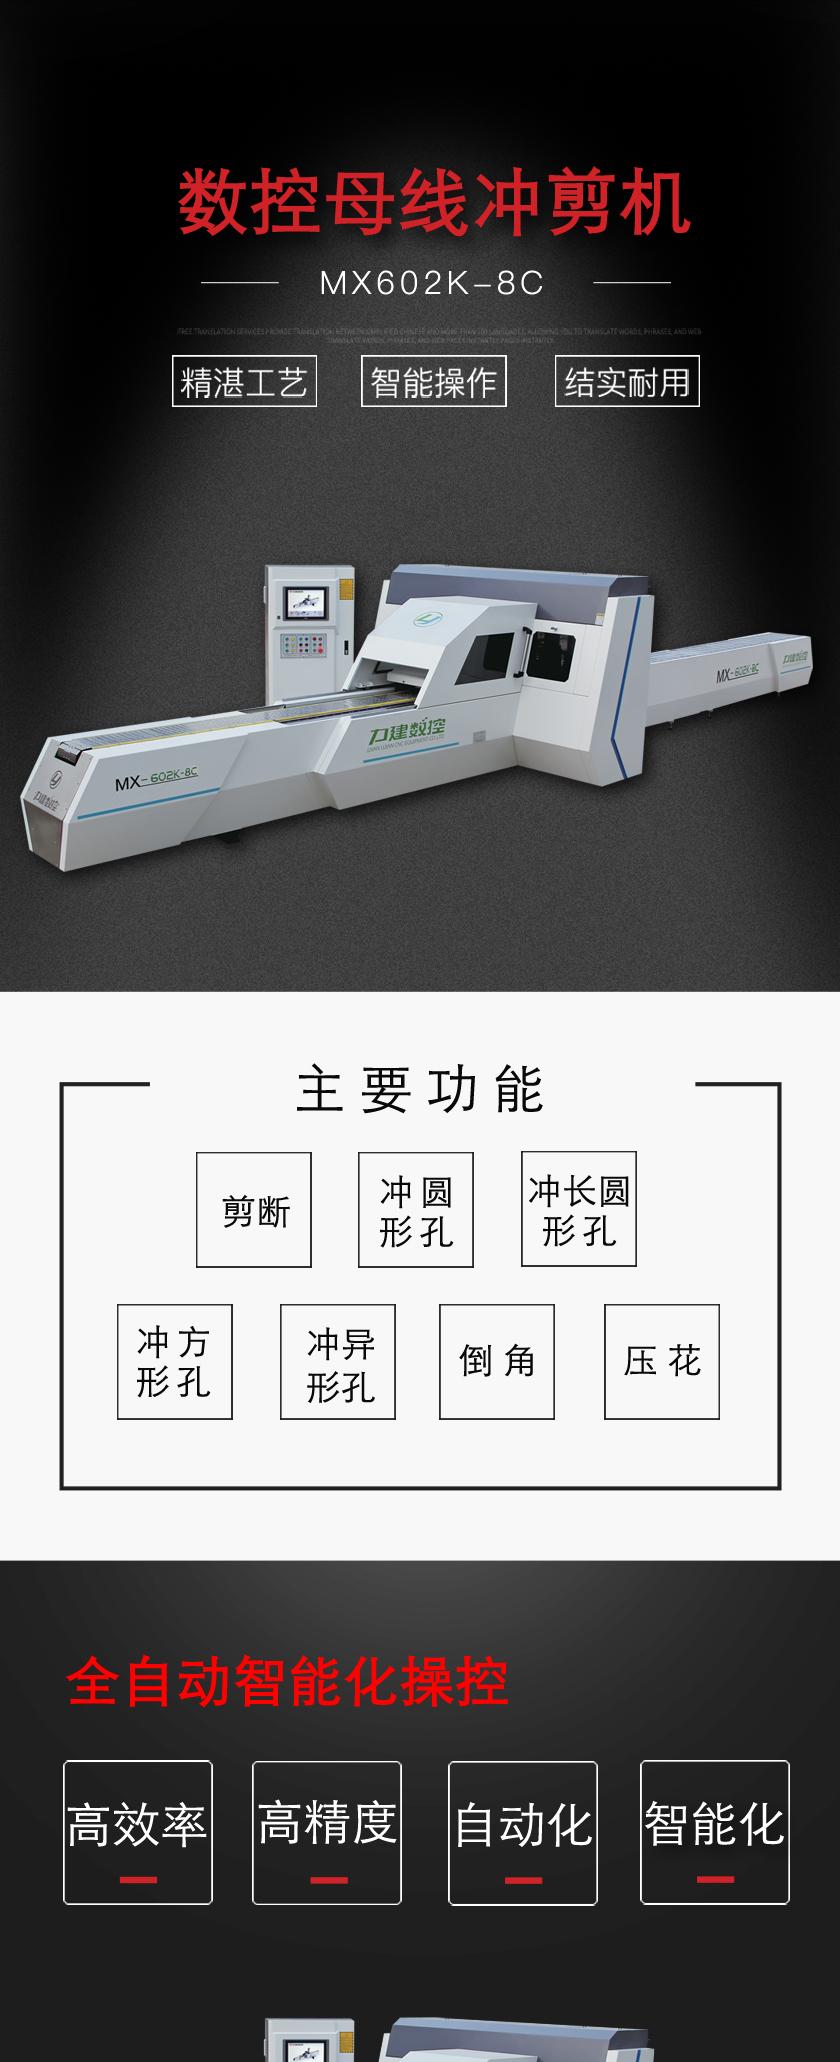 MX602K-8C数控母线冲剪机